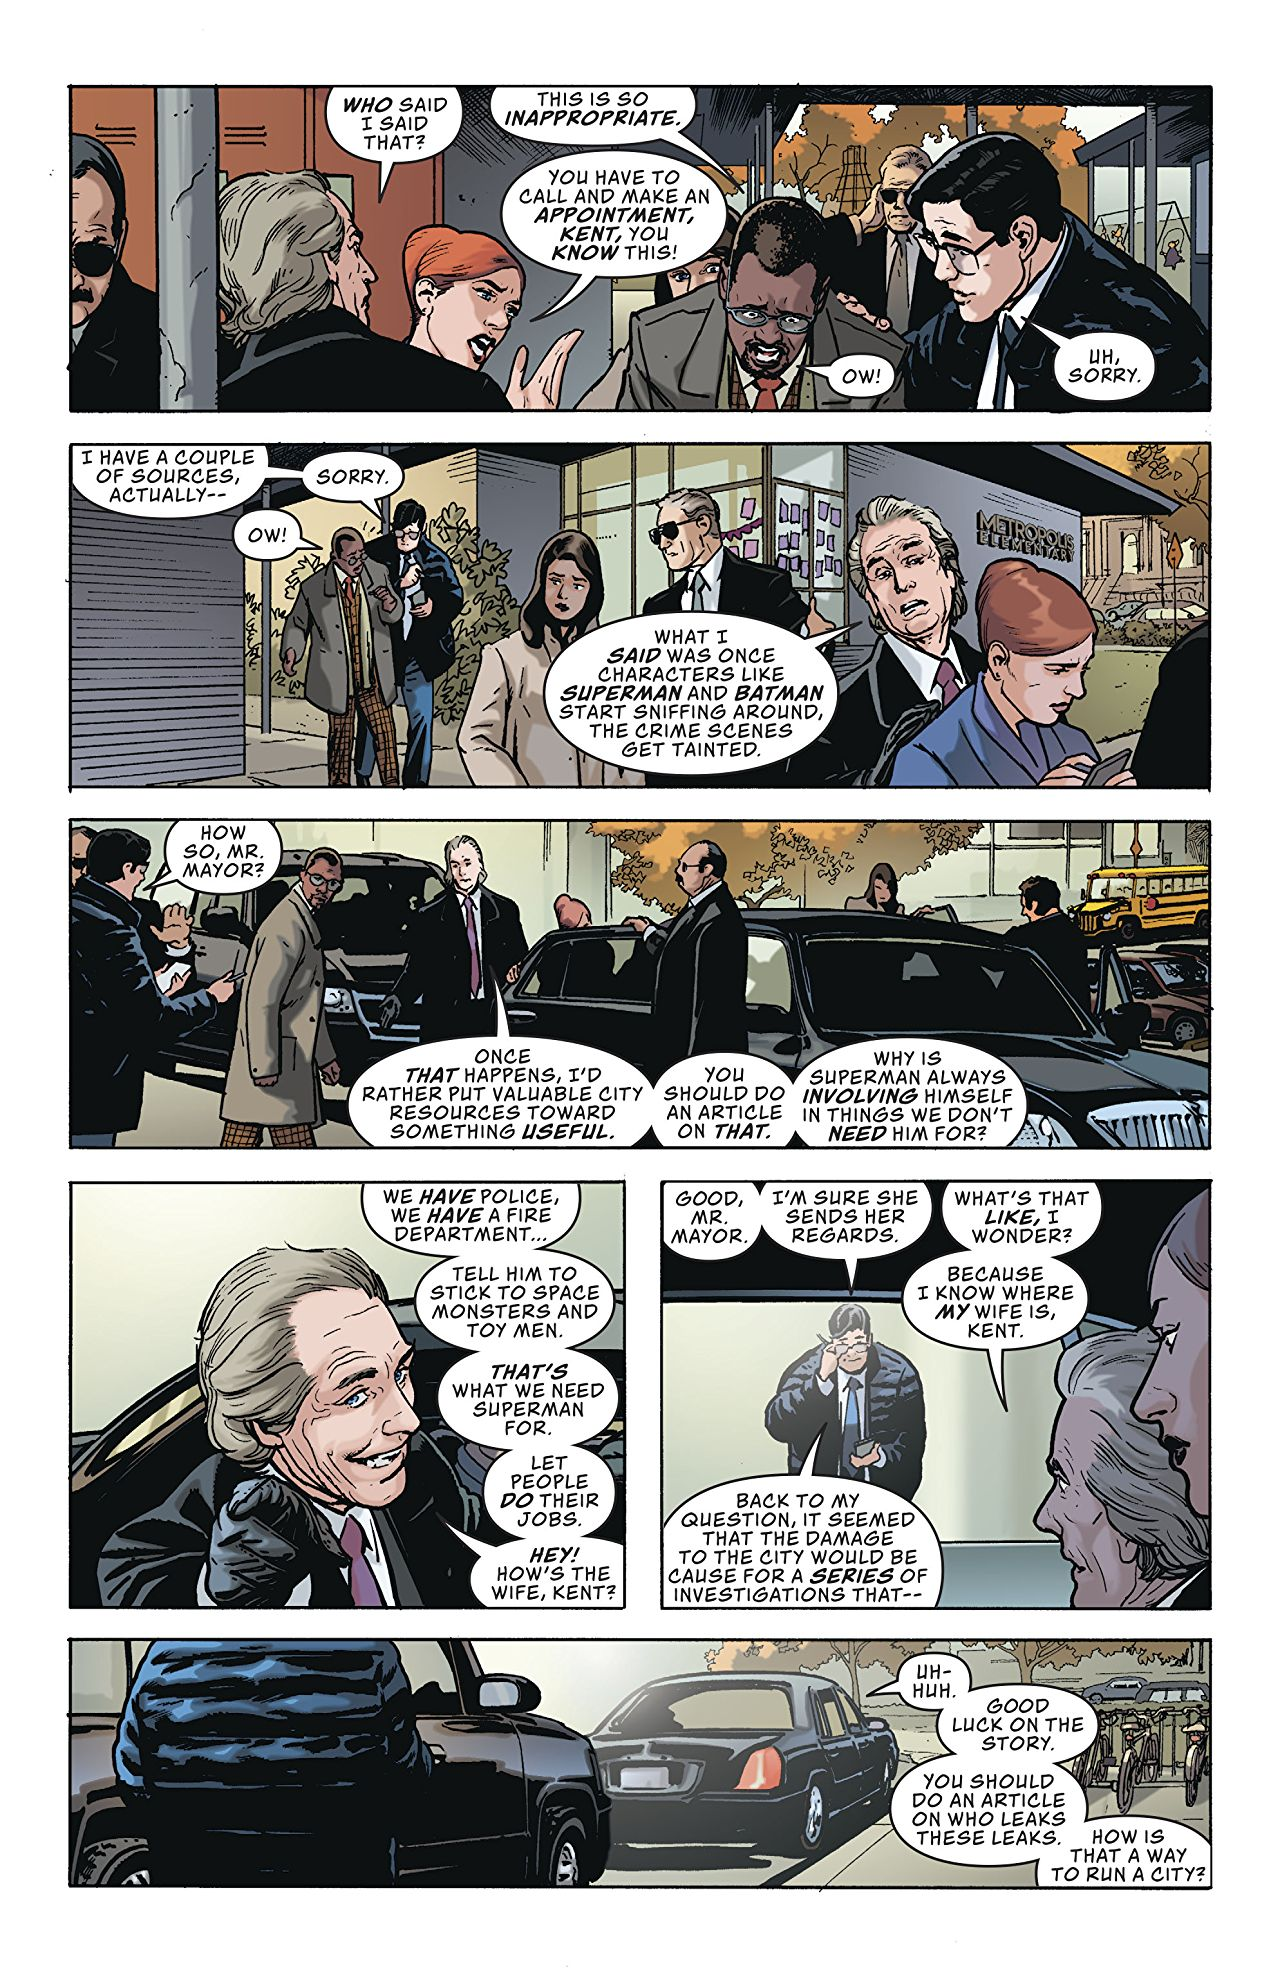 Action Comics 1006 3.jpg